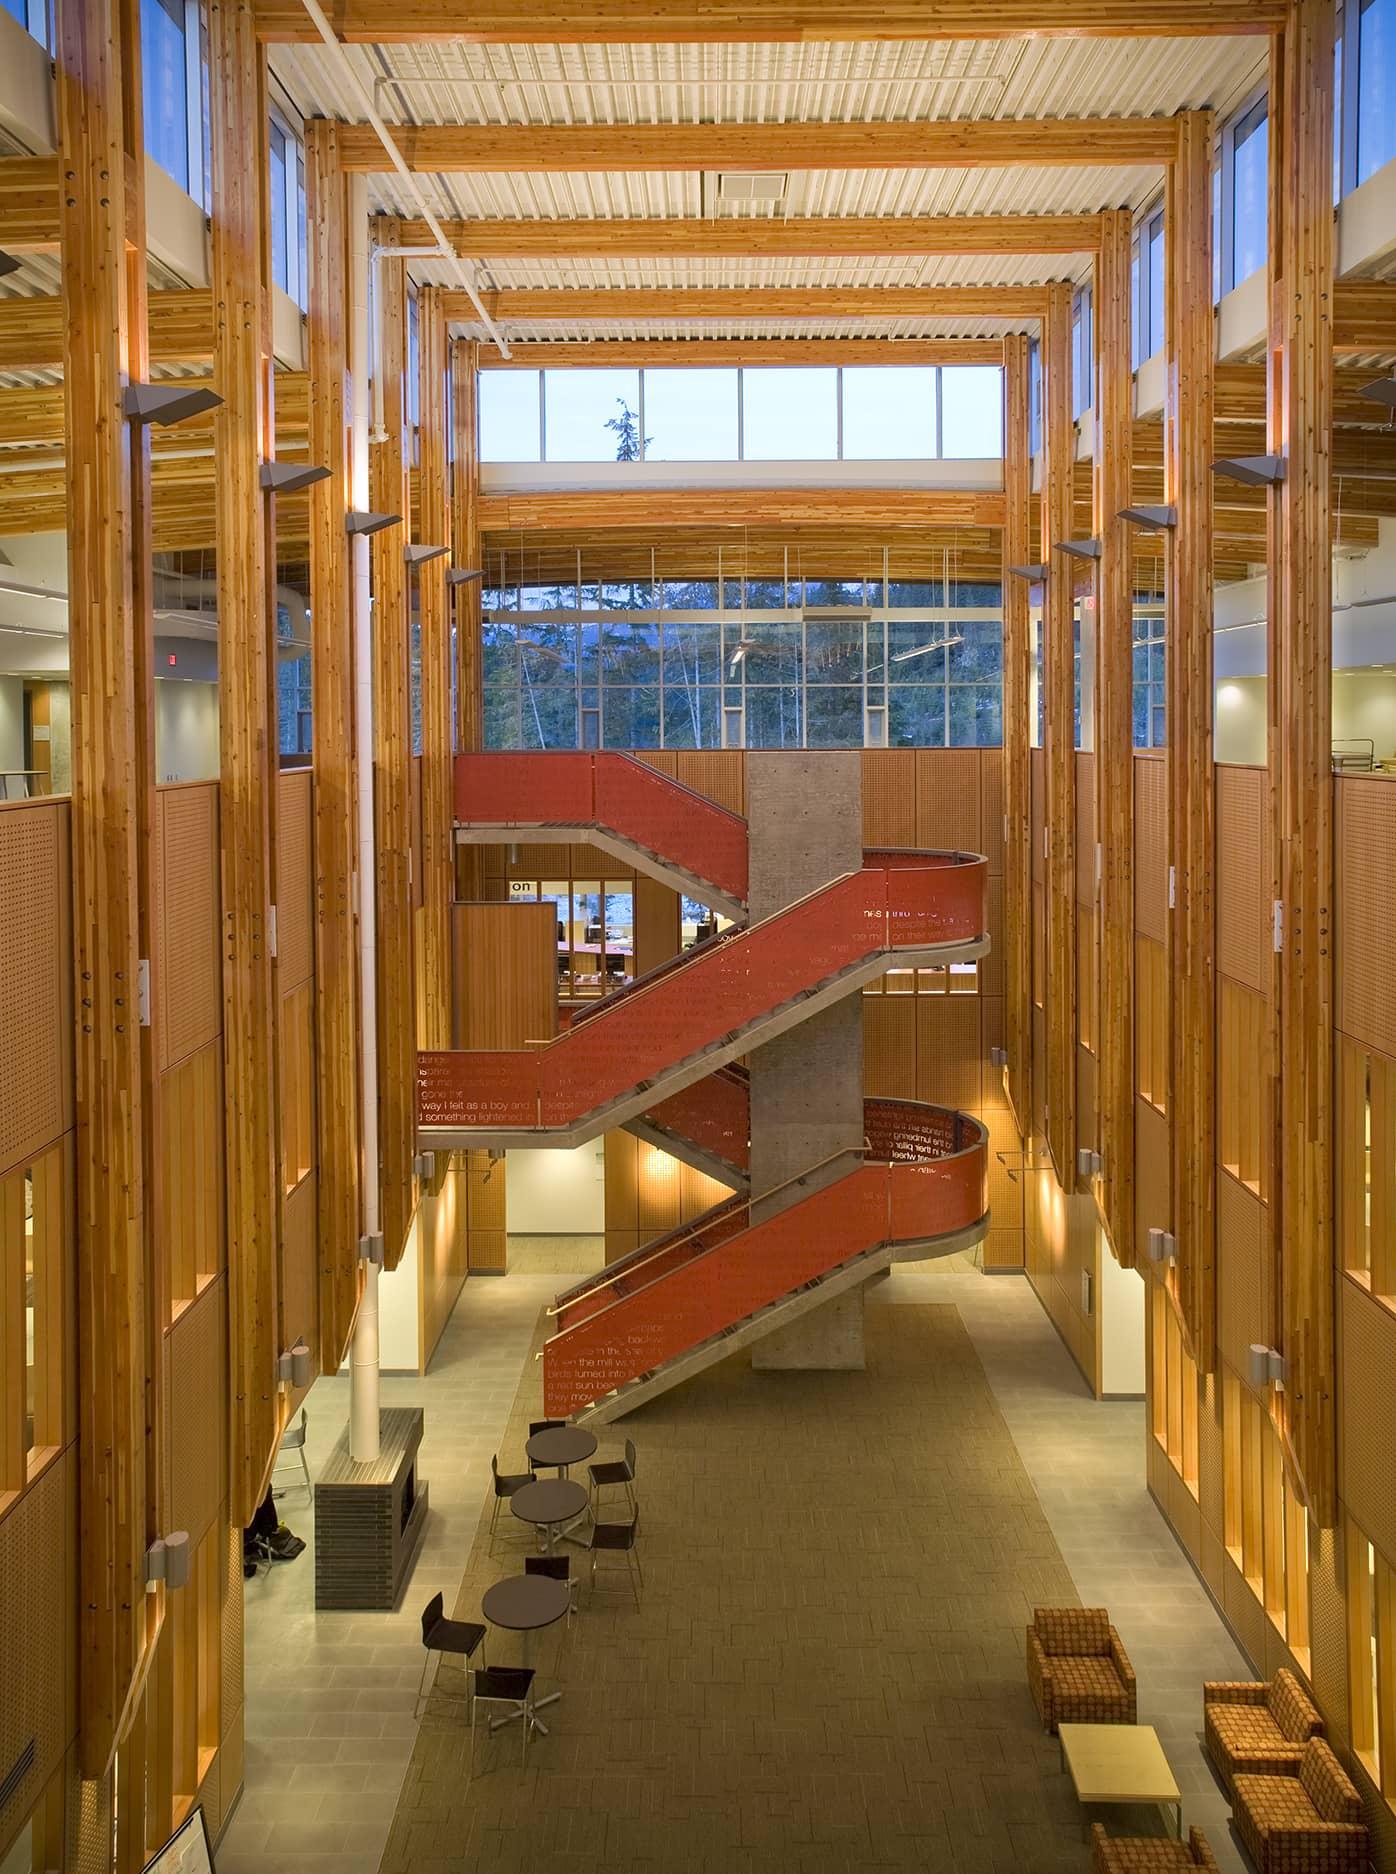 bbp quest university library